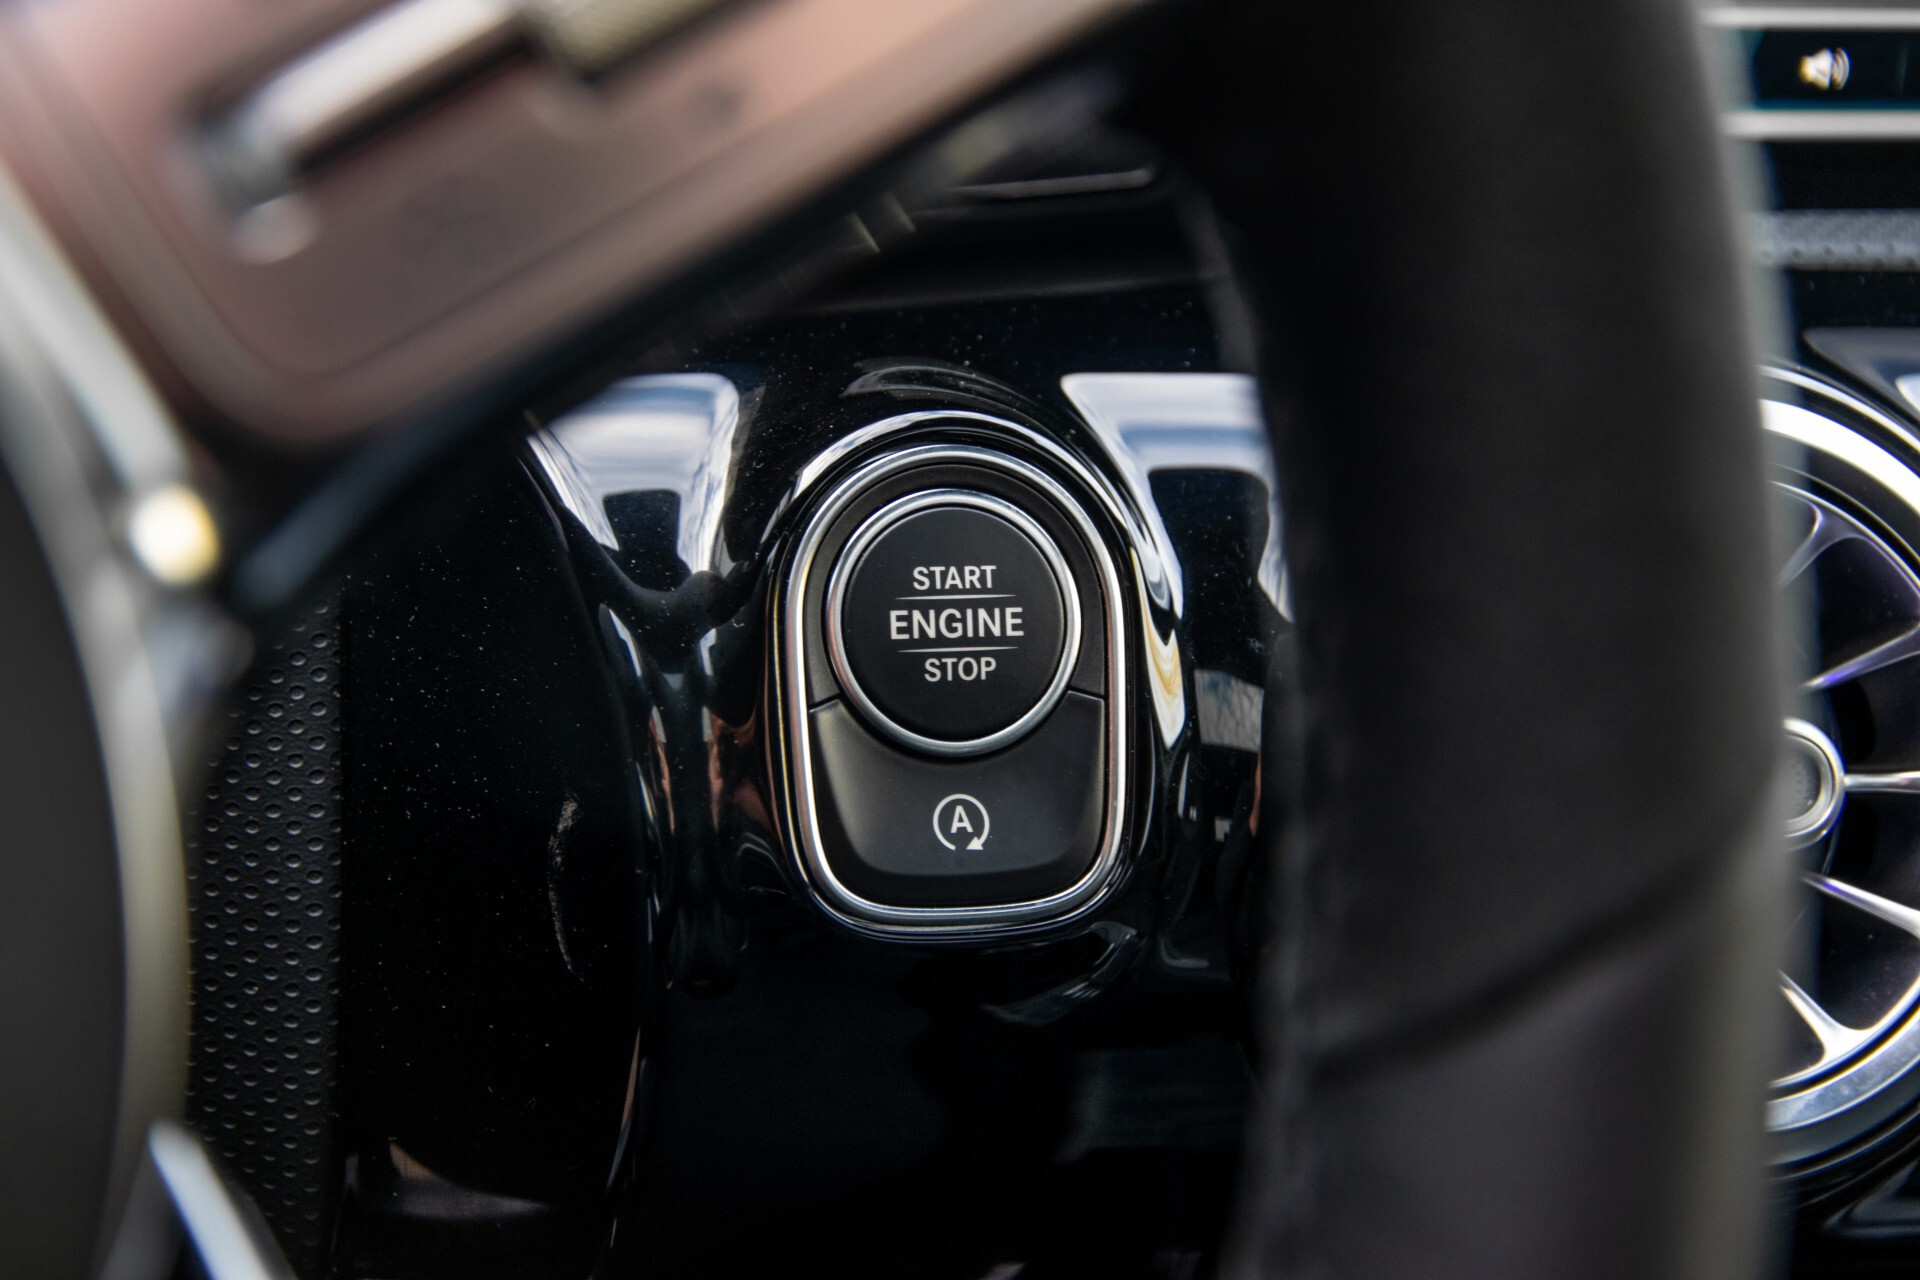 Mercedes-Benz A-Klasse 250 4-M AMG Panorama/Keyless-Entry/MBUX/HUD/Burmester/360/Multibeam LED Aut7 Foto 29